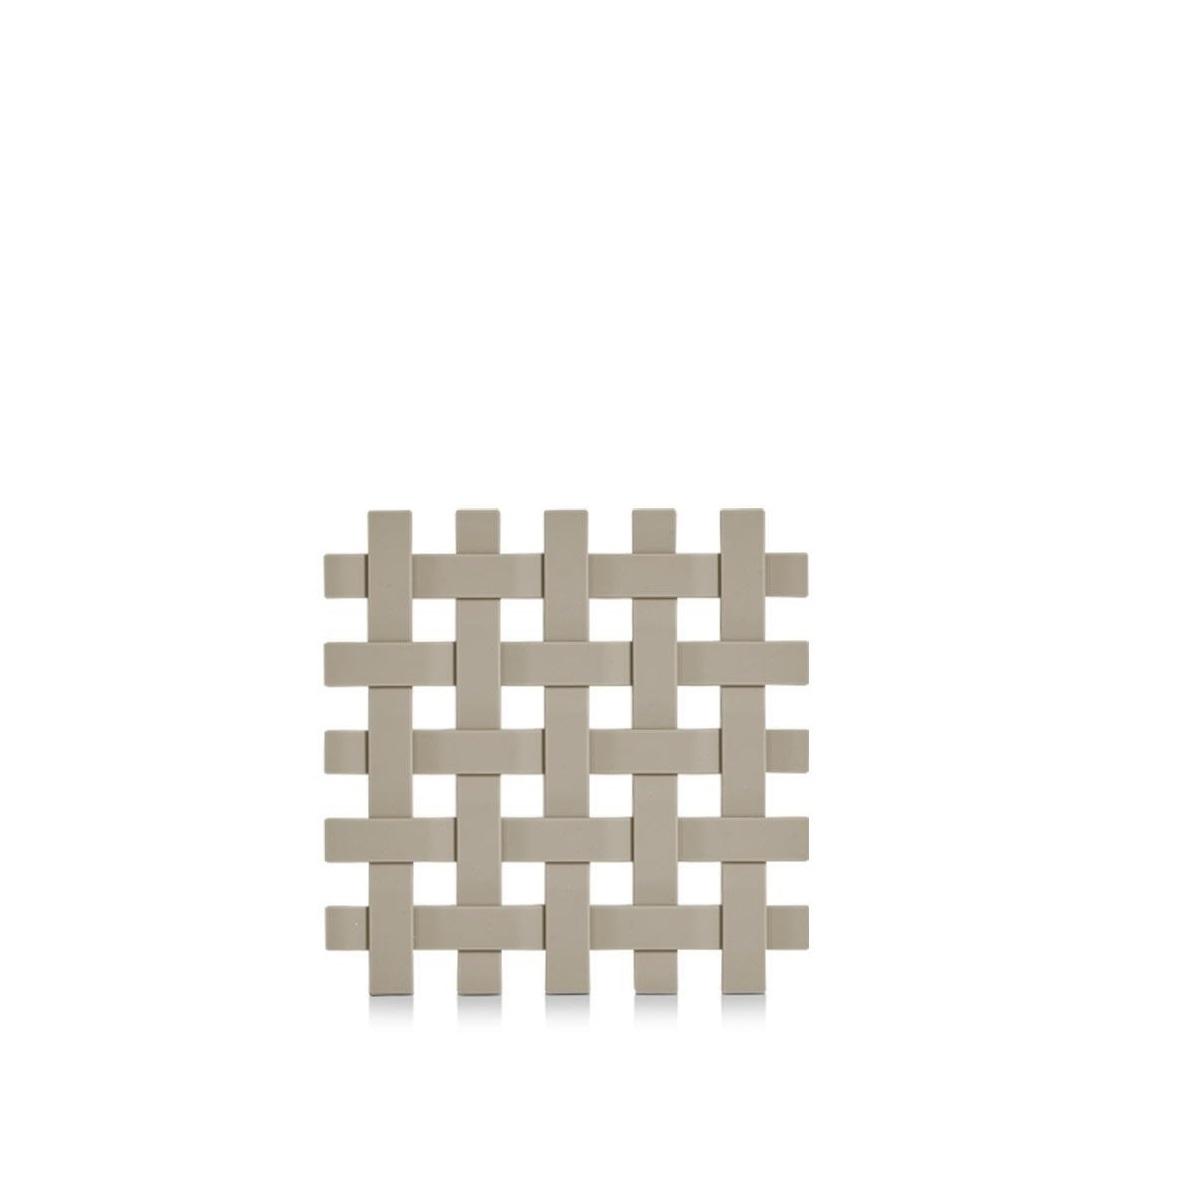 Suport pentru vesela, din plastic Trivet Grej, L17,2xl17,2 cm imagine